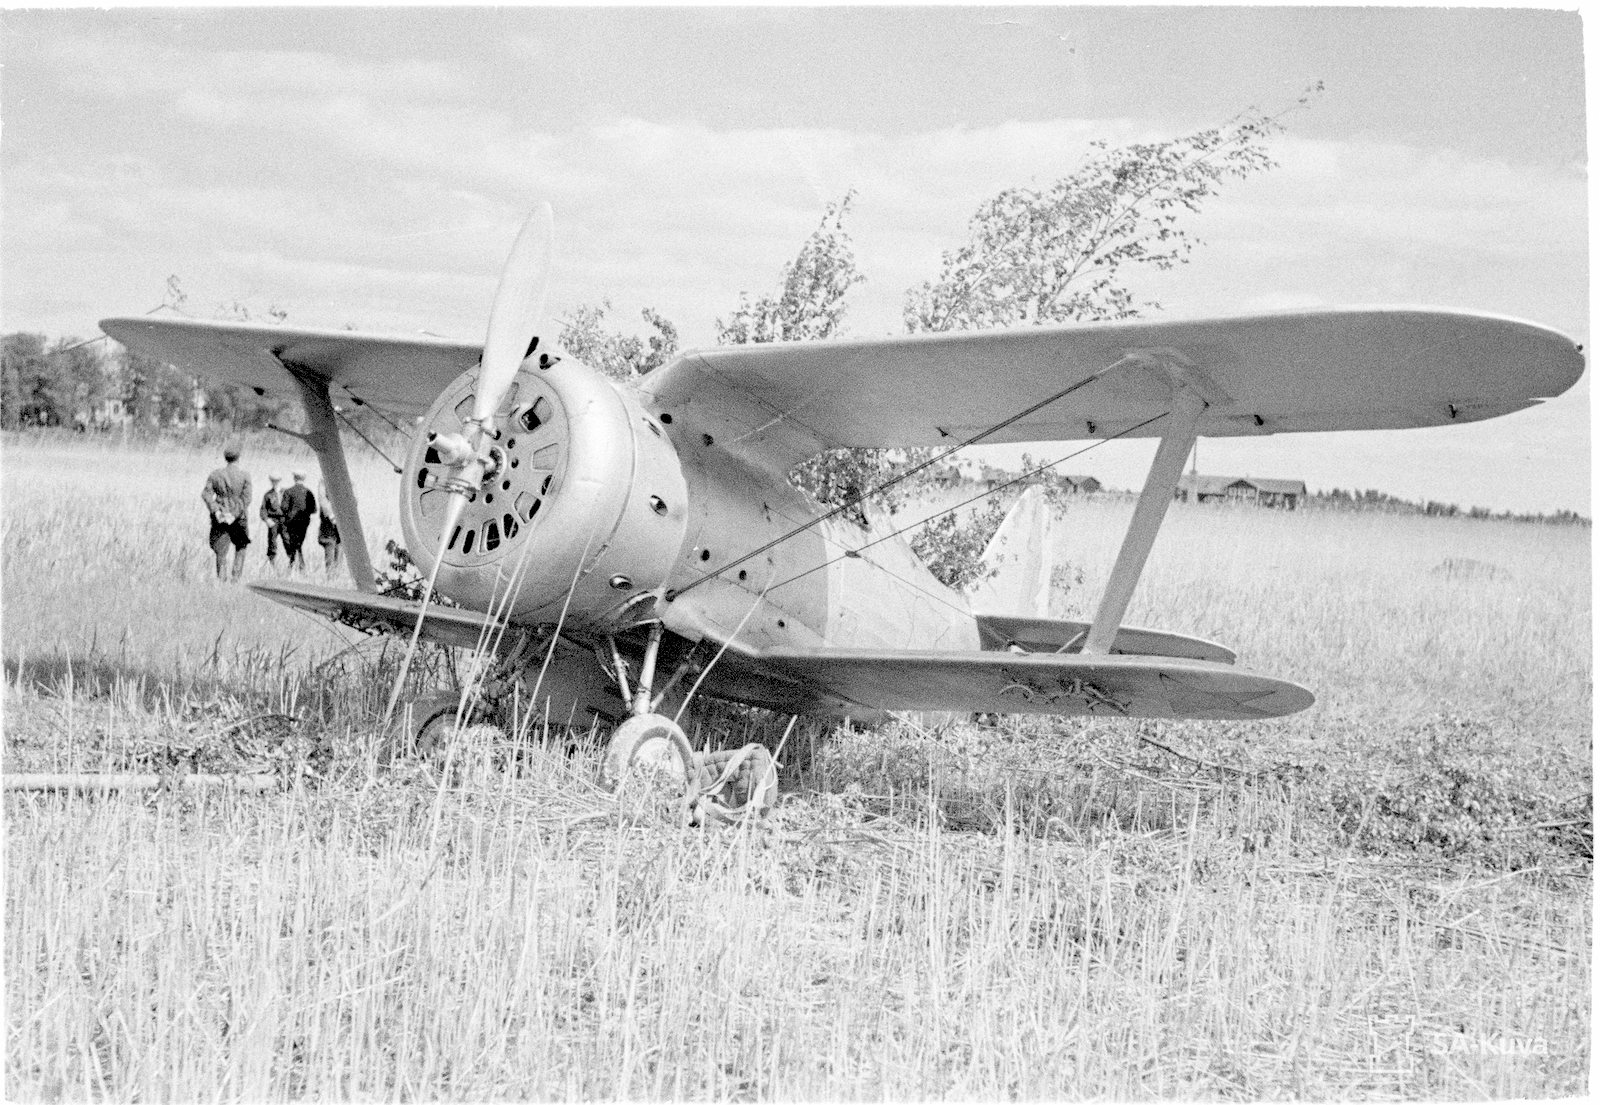 Polikarpov_I-153_SA-kuva_20616.jpg